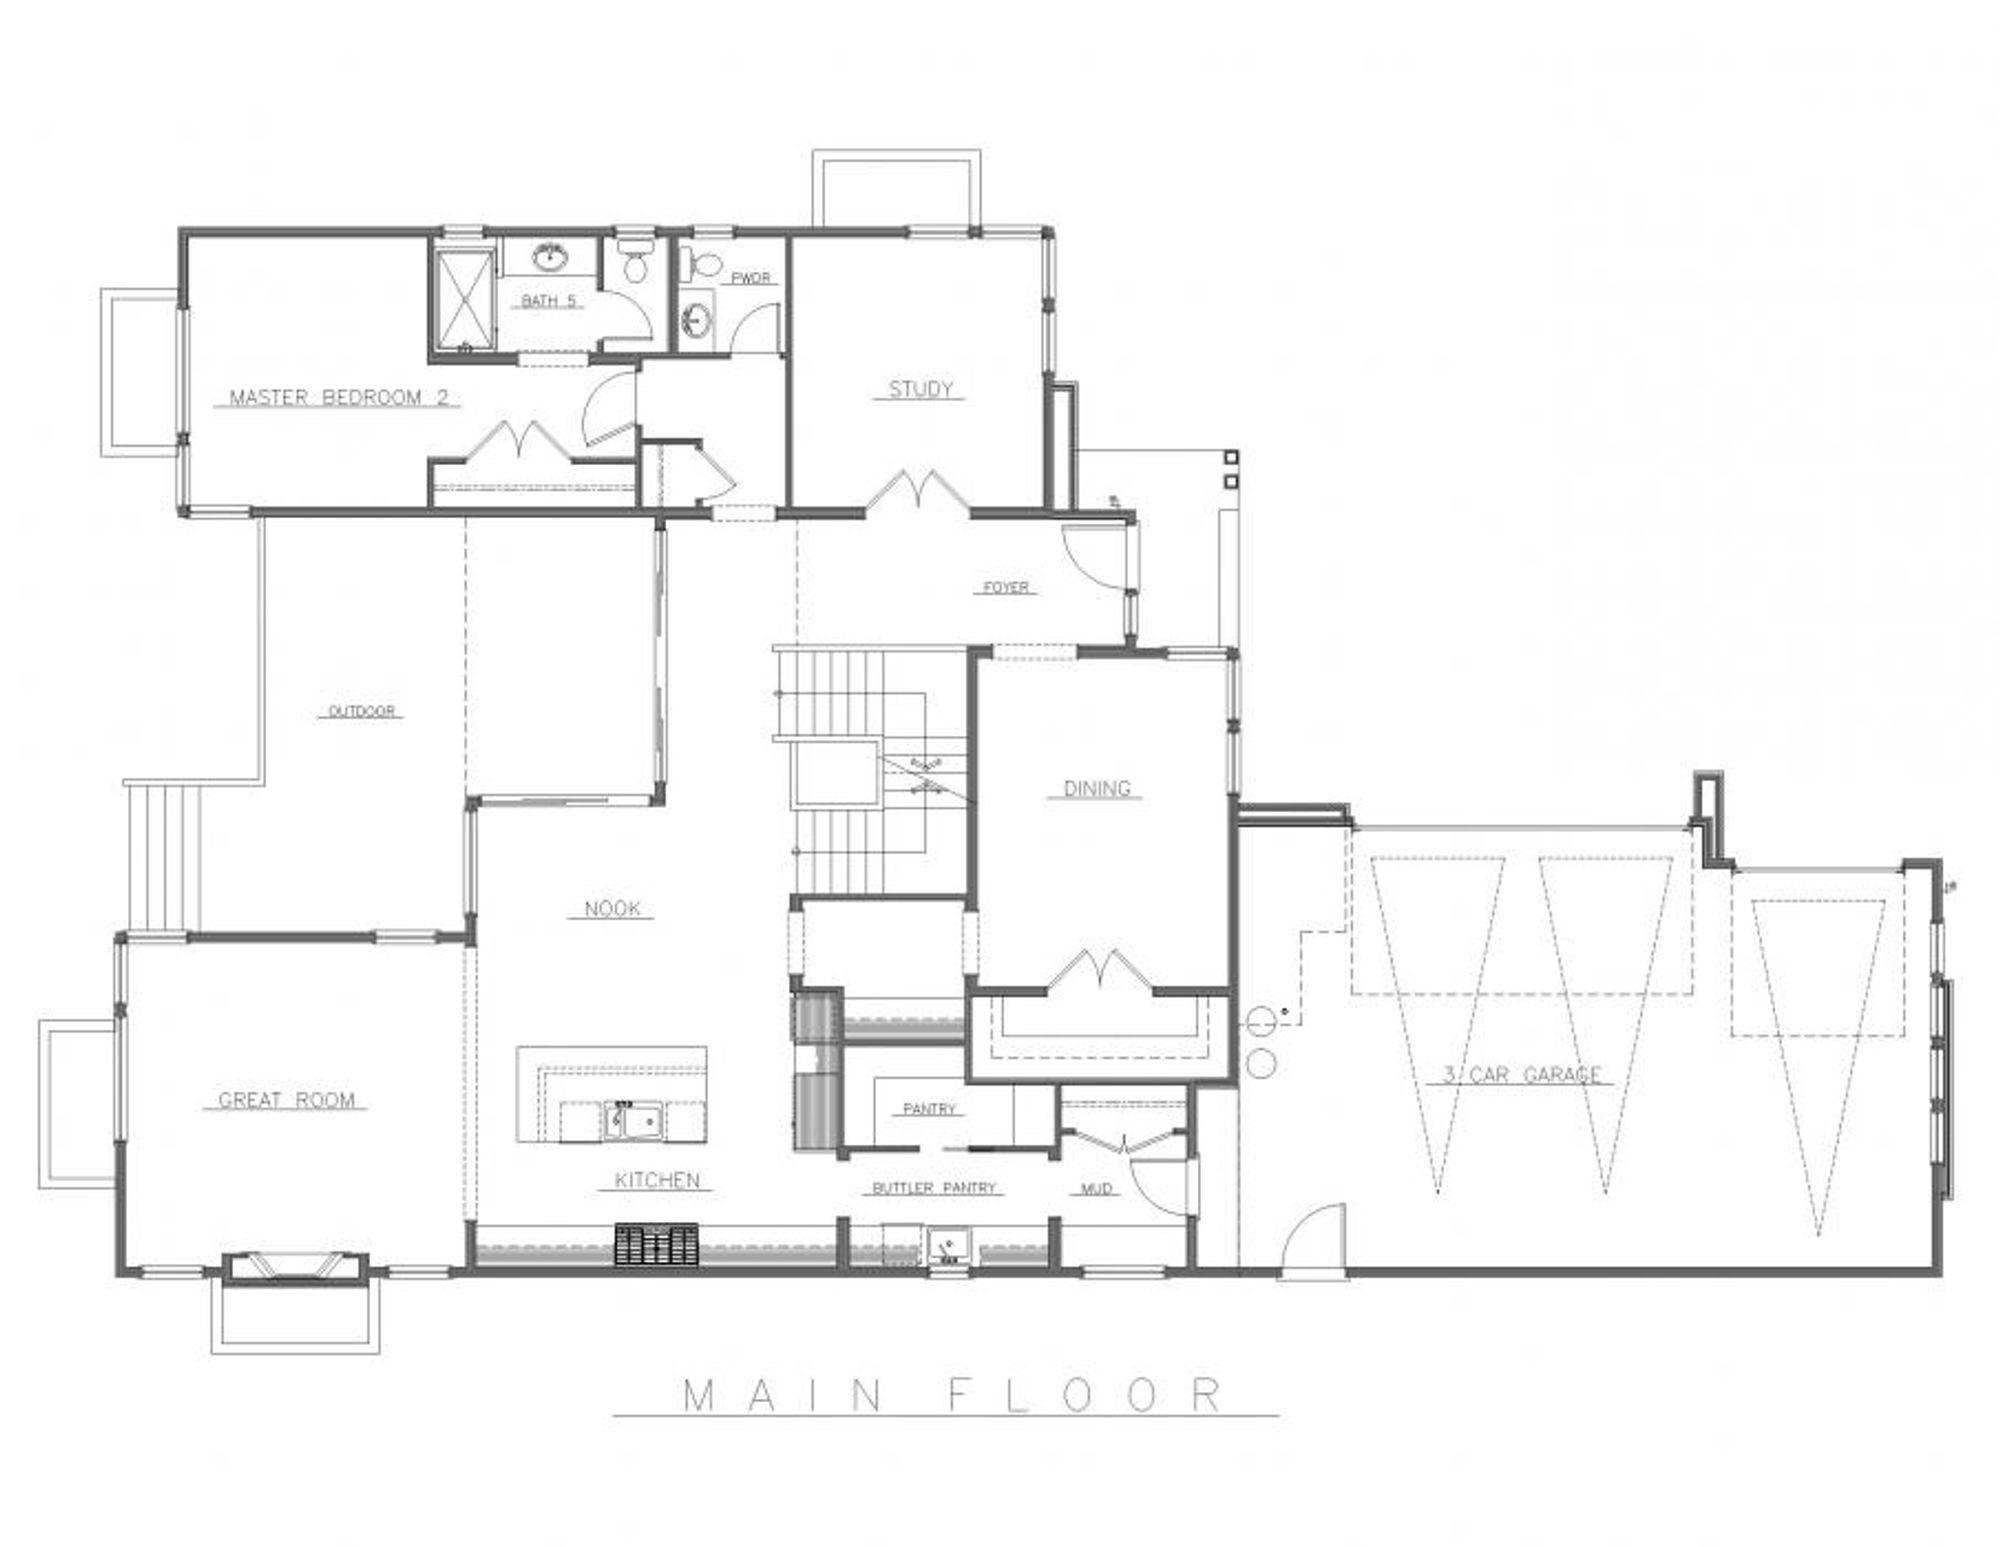 The Bordeaux Main Floor Plan